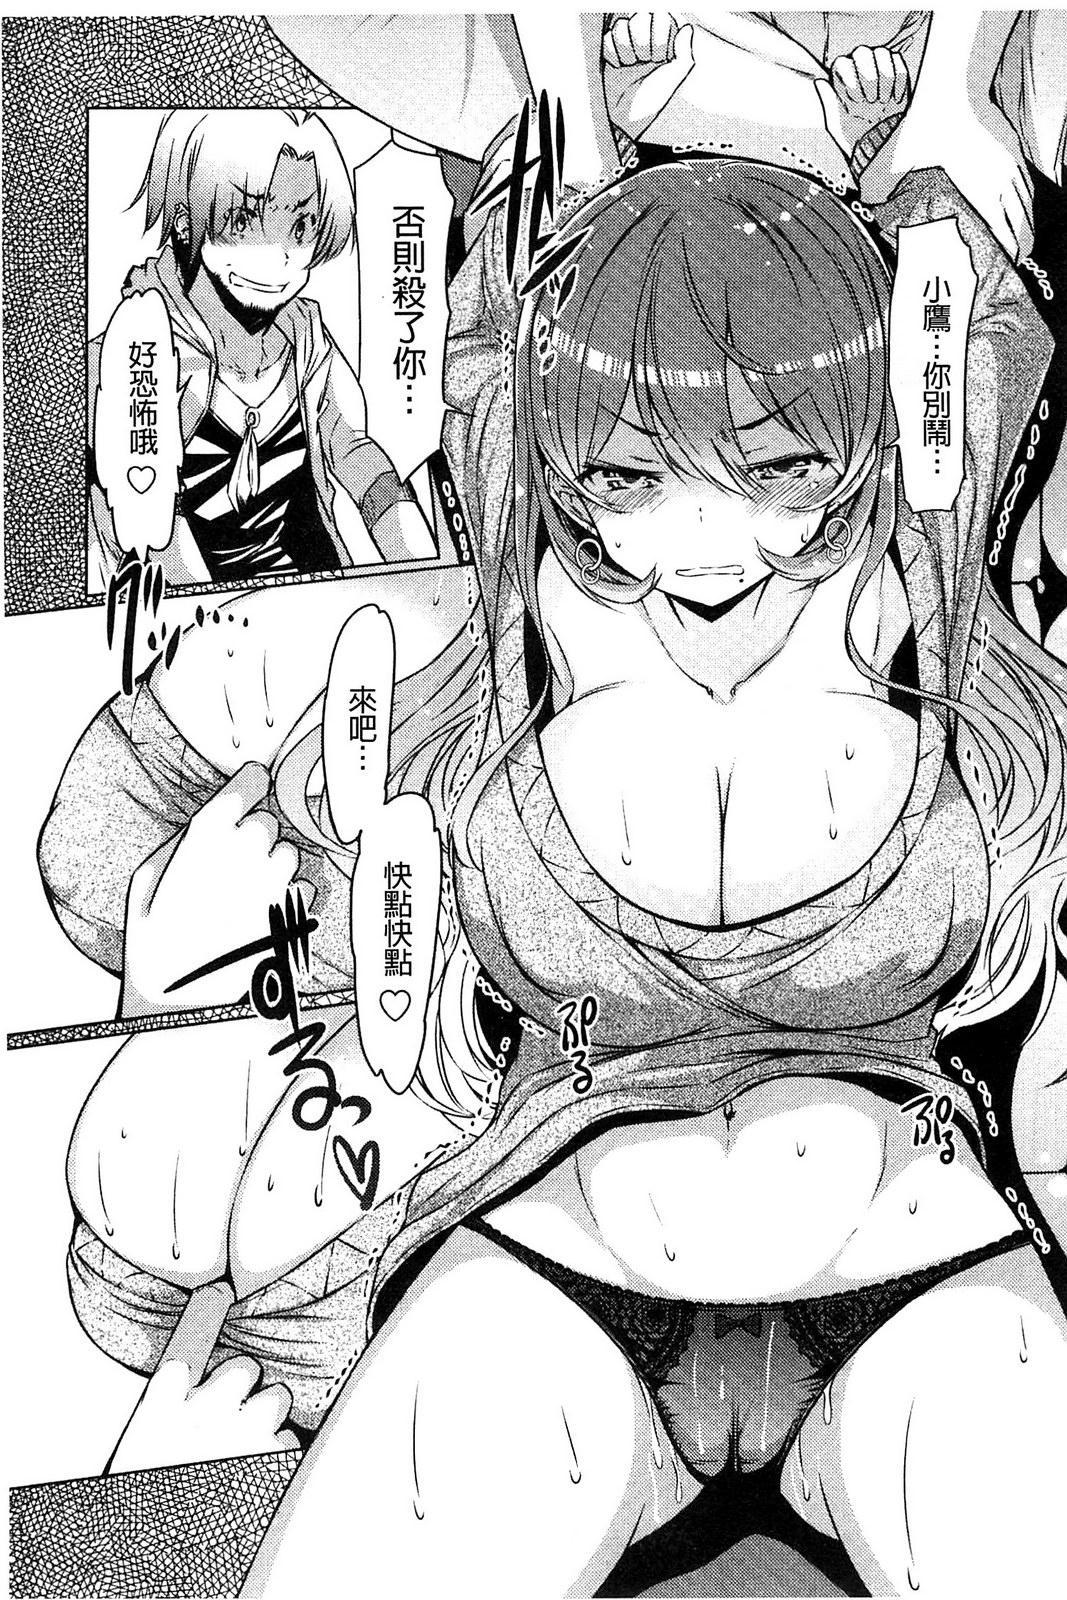 Imouto Kansatsu Nikki - The Record of Sex with My Sister 193